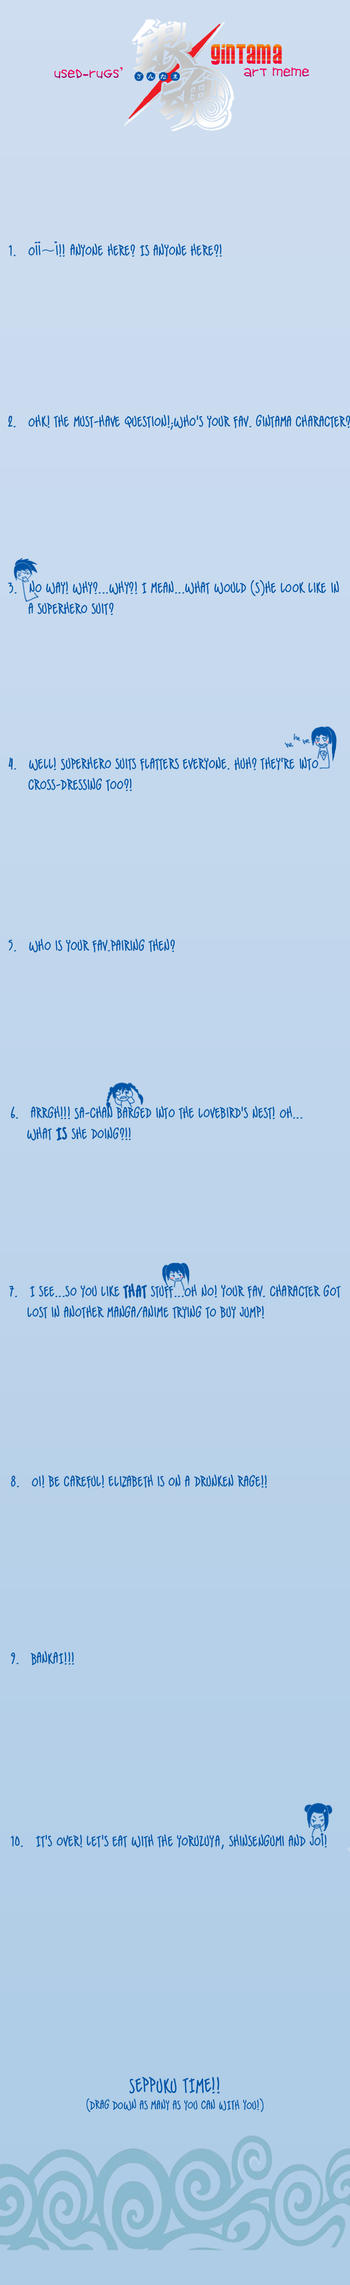 Gintama art meme by used-rugs